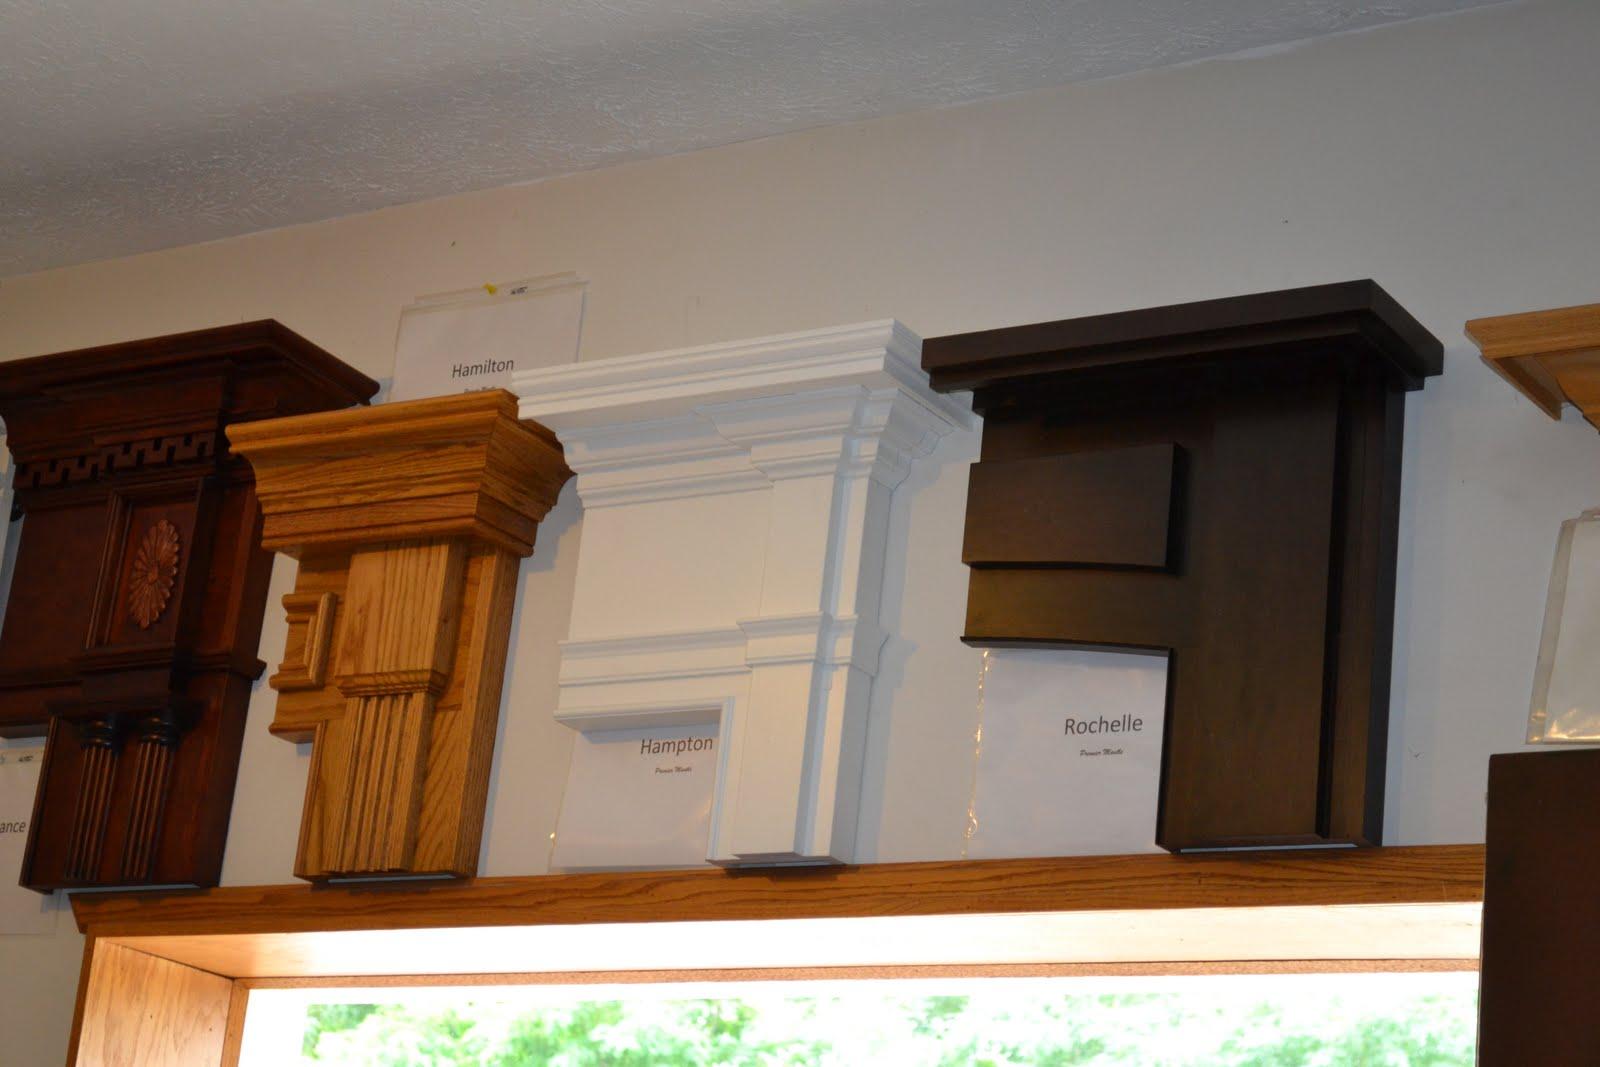 Lighting Basement Washroom Stairs: De Jong Dream House: Fireplaces, Revisited